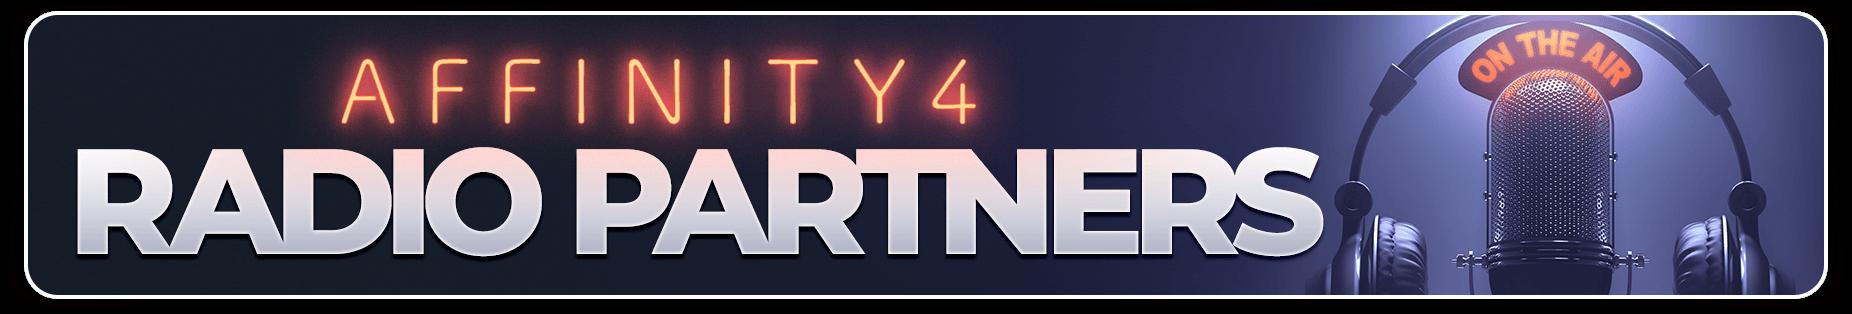 Affinity4 Radio Partners